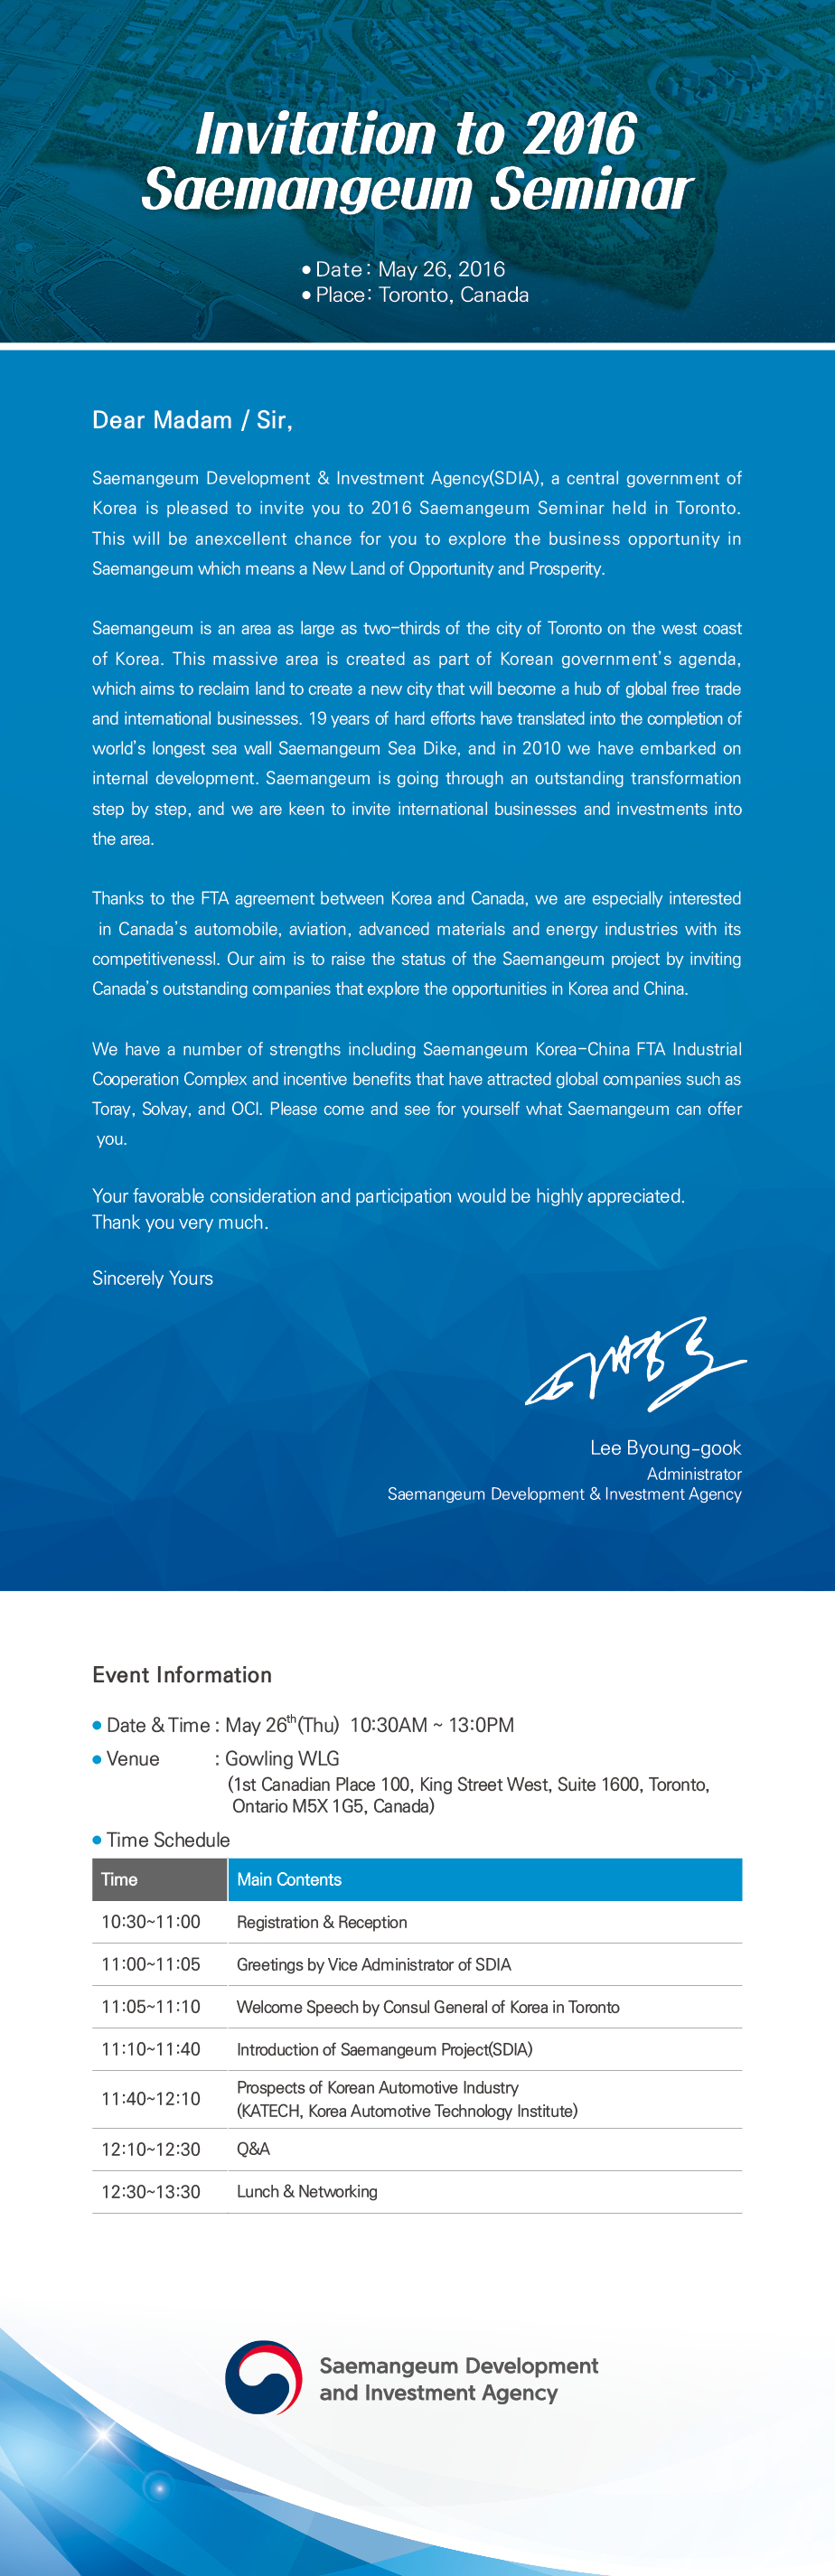 Invitation - Saemangeum Korea Seminar - Toronto Canada